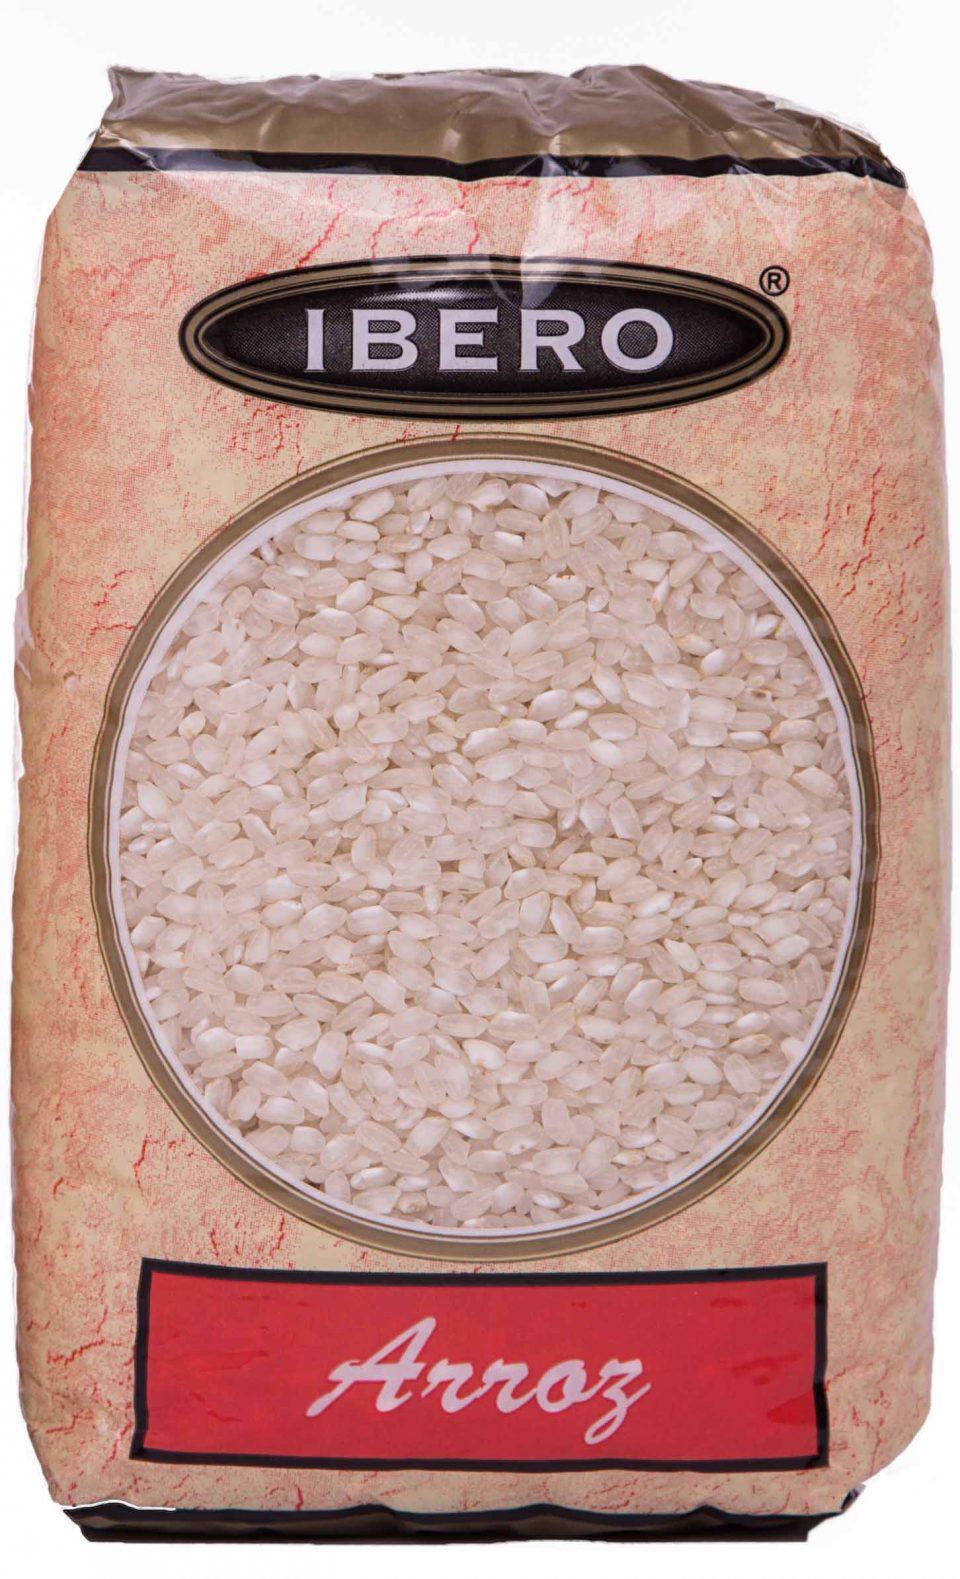 Arroz Extra Ibero 1 kg